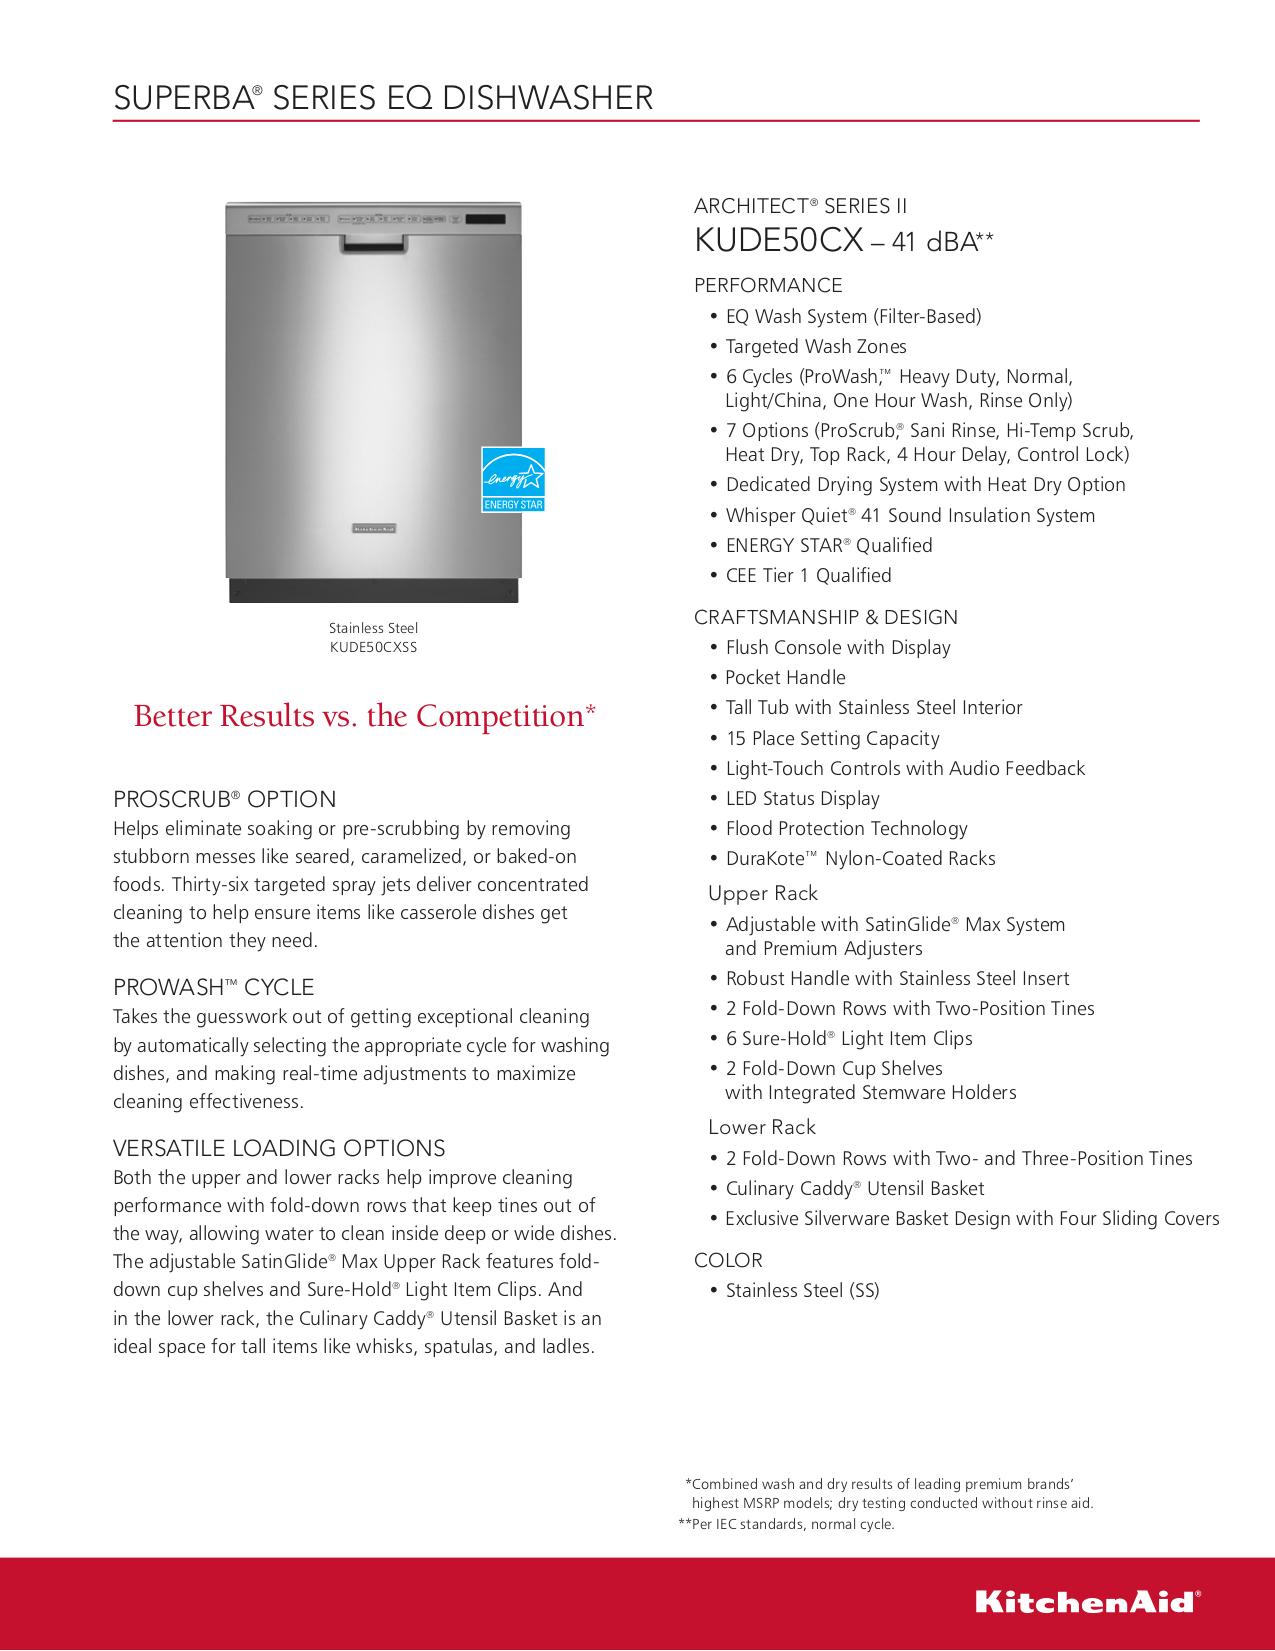 download free pdf for kitchenaid superba kude50cxss dishwasher manual rh umlib com kitchenaid superba dishwasher instructions kitchenaid superba dishwasher instructions